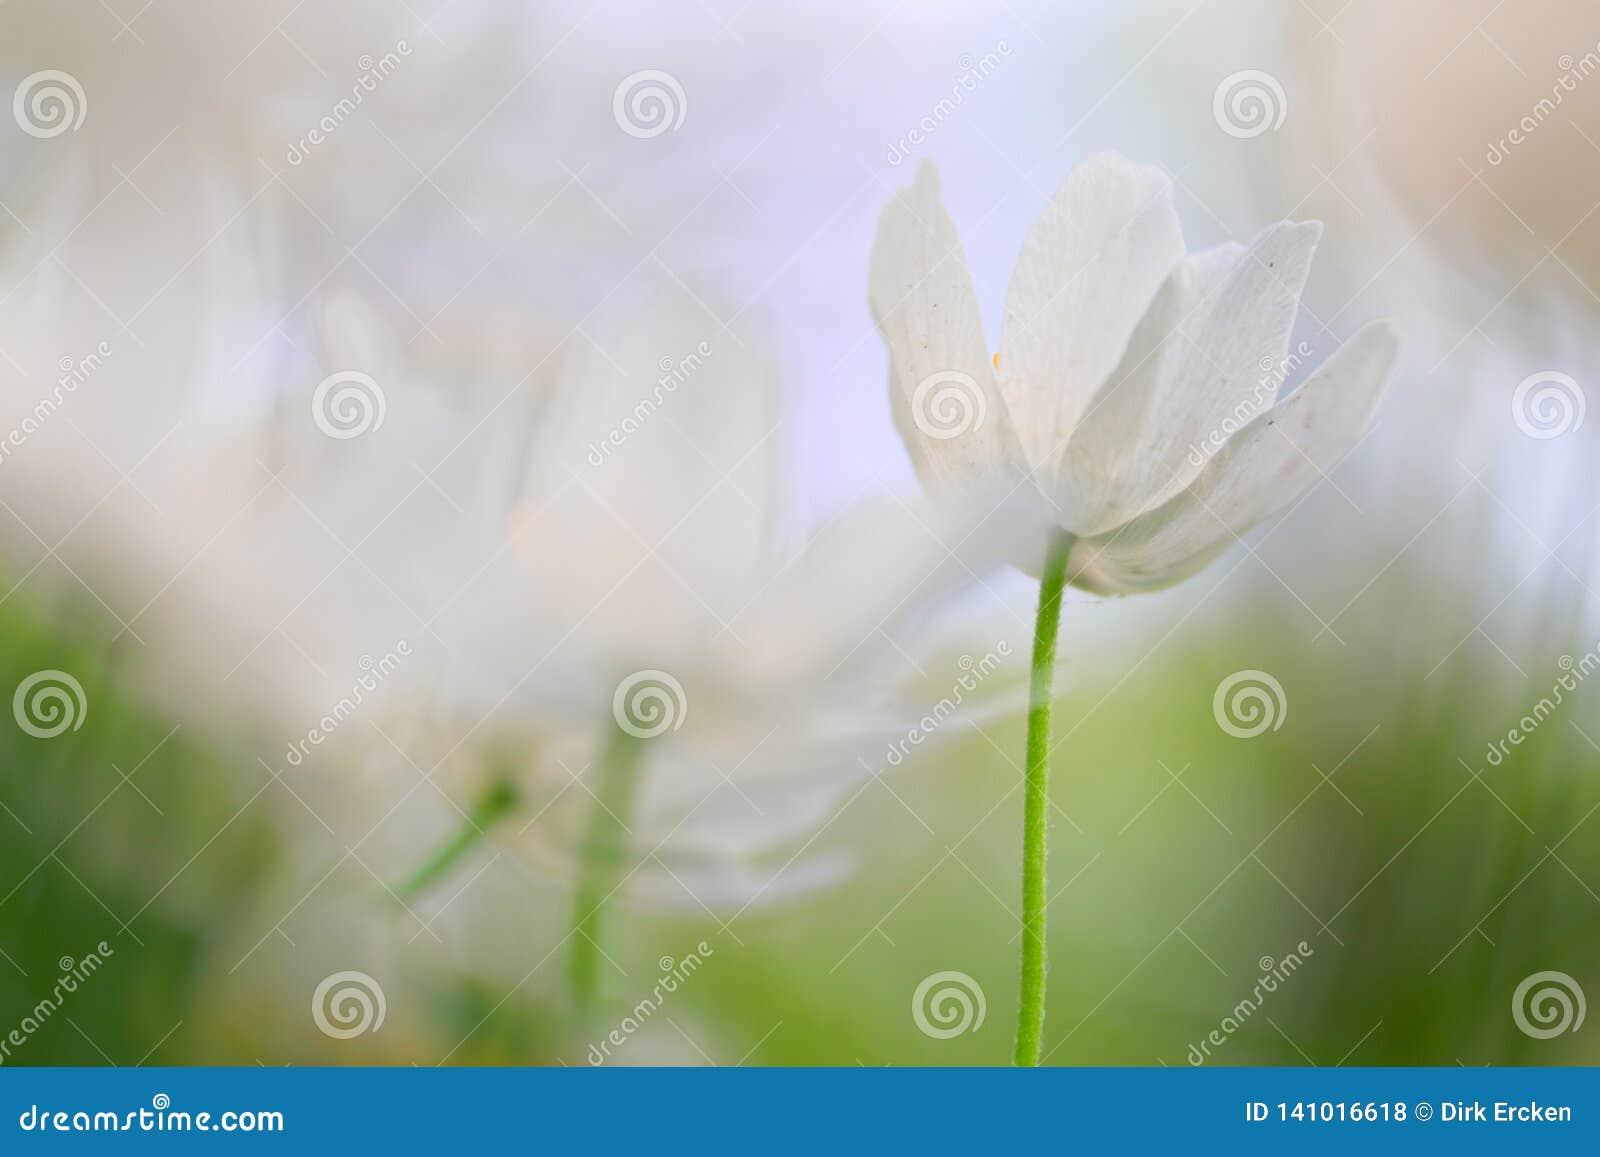 Wood anemone minimalism